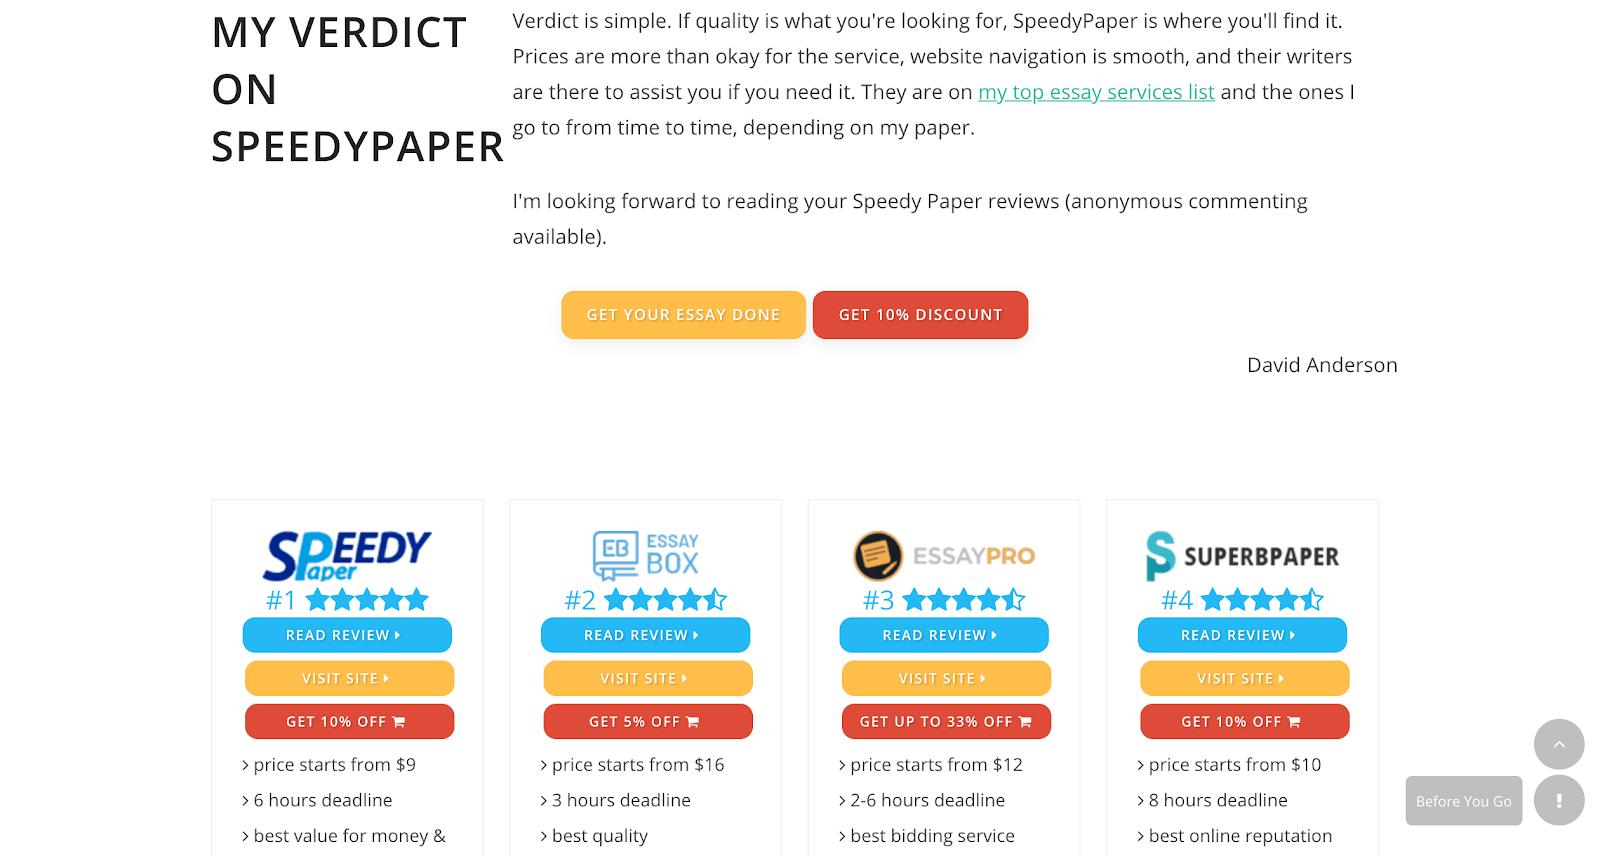 speedy paper reviews at ihatewritingessays